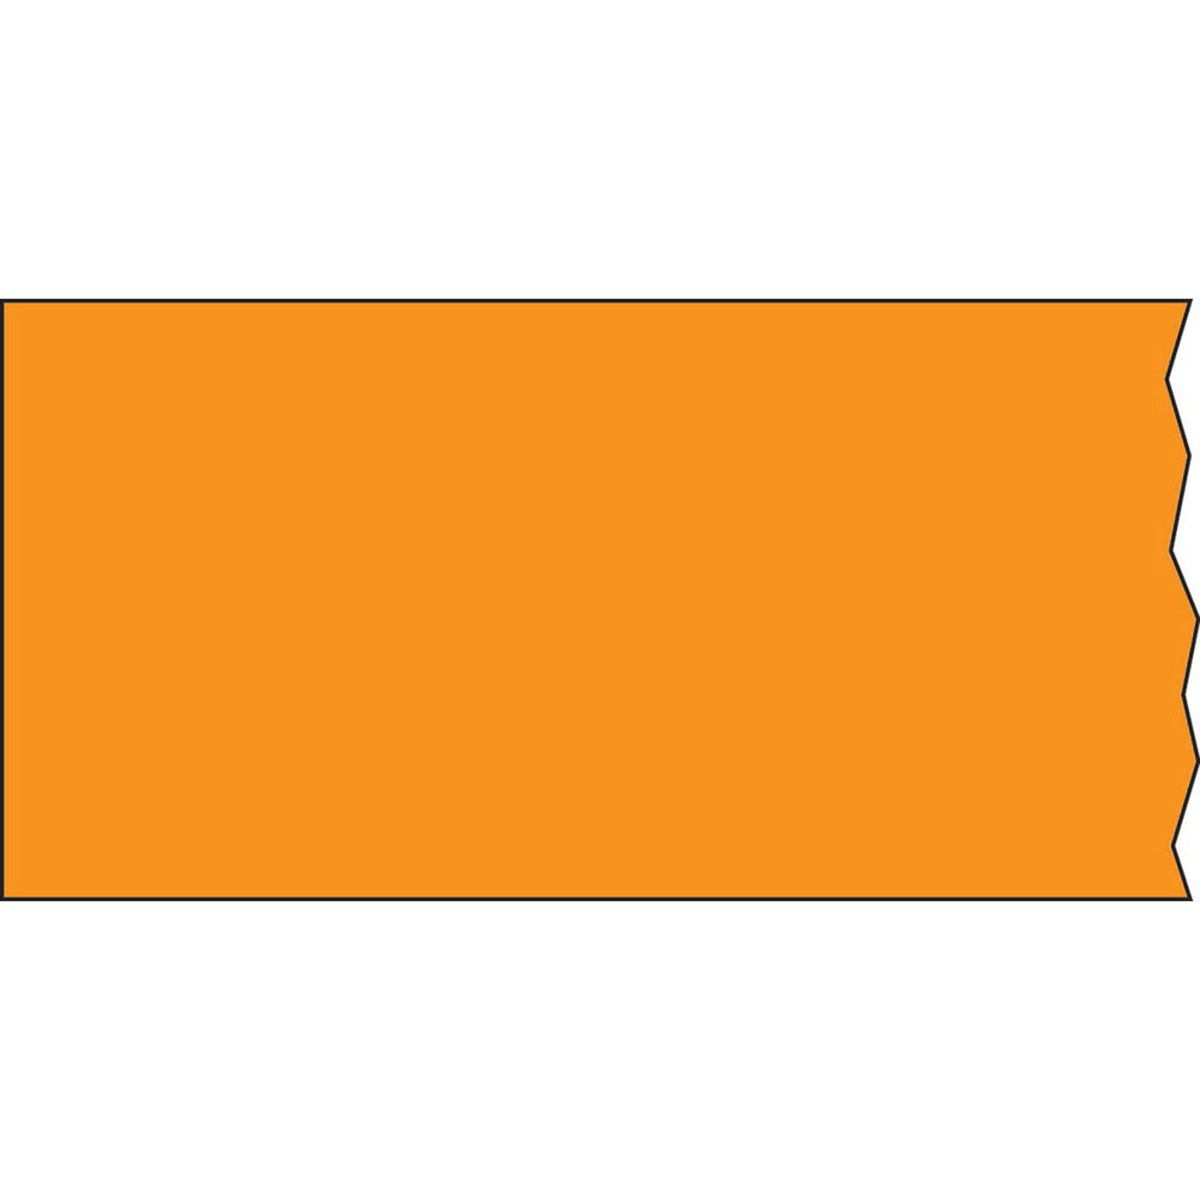 TIMETAPE T-502-6 Tape, Removable, 1'' Core, 2'' x 500'', Imprints Orange (Pack of 1)